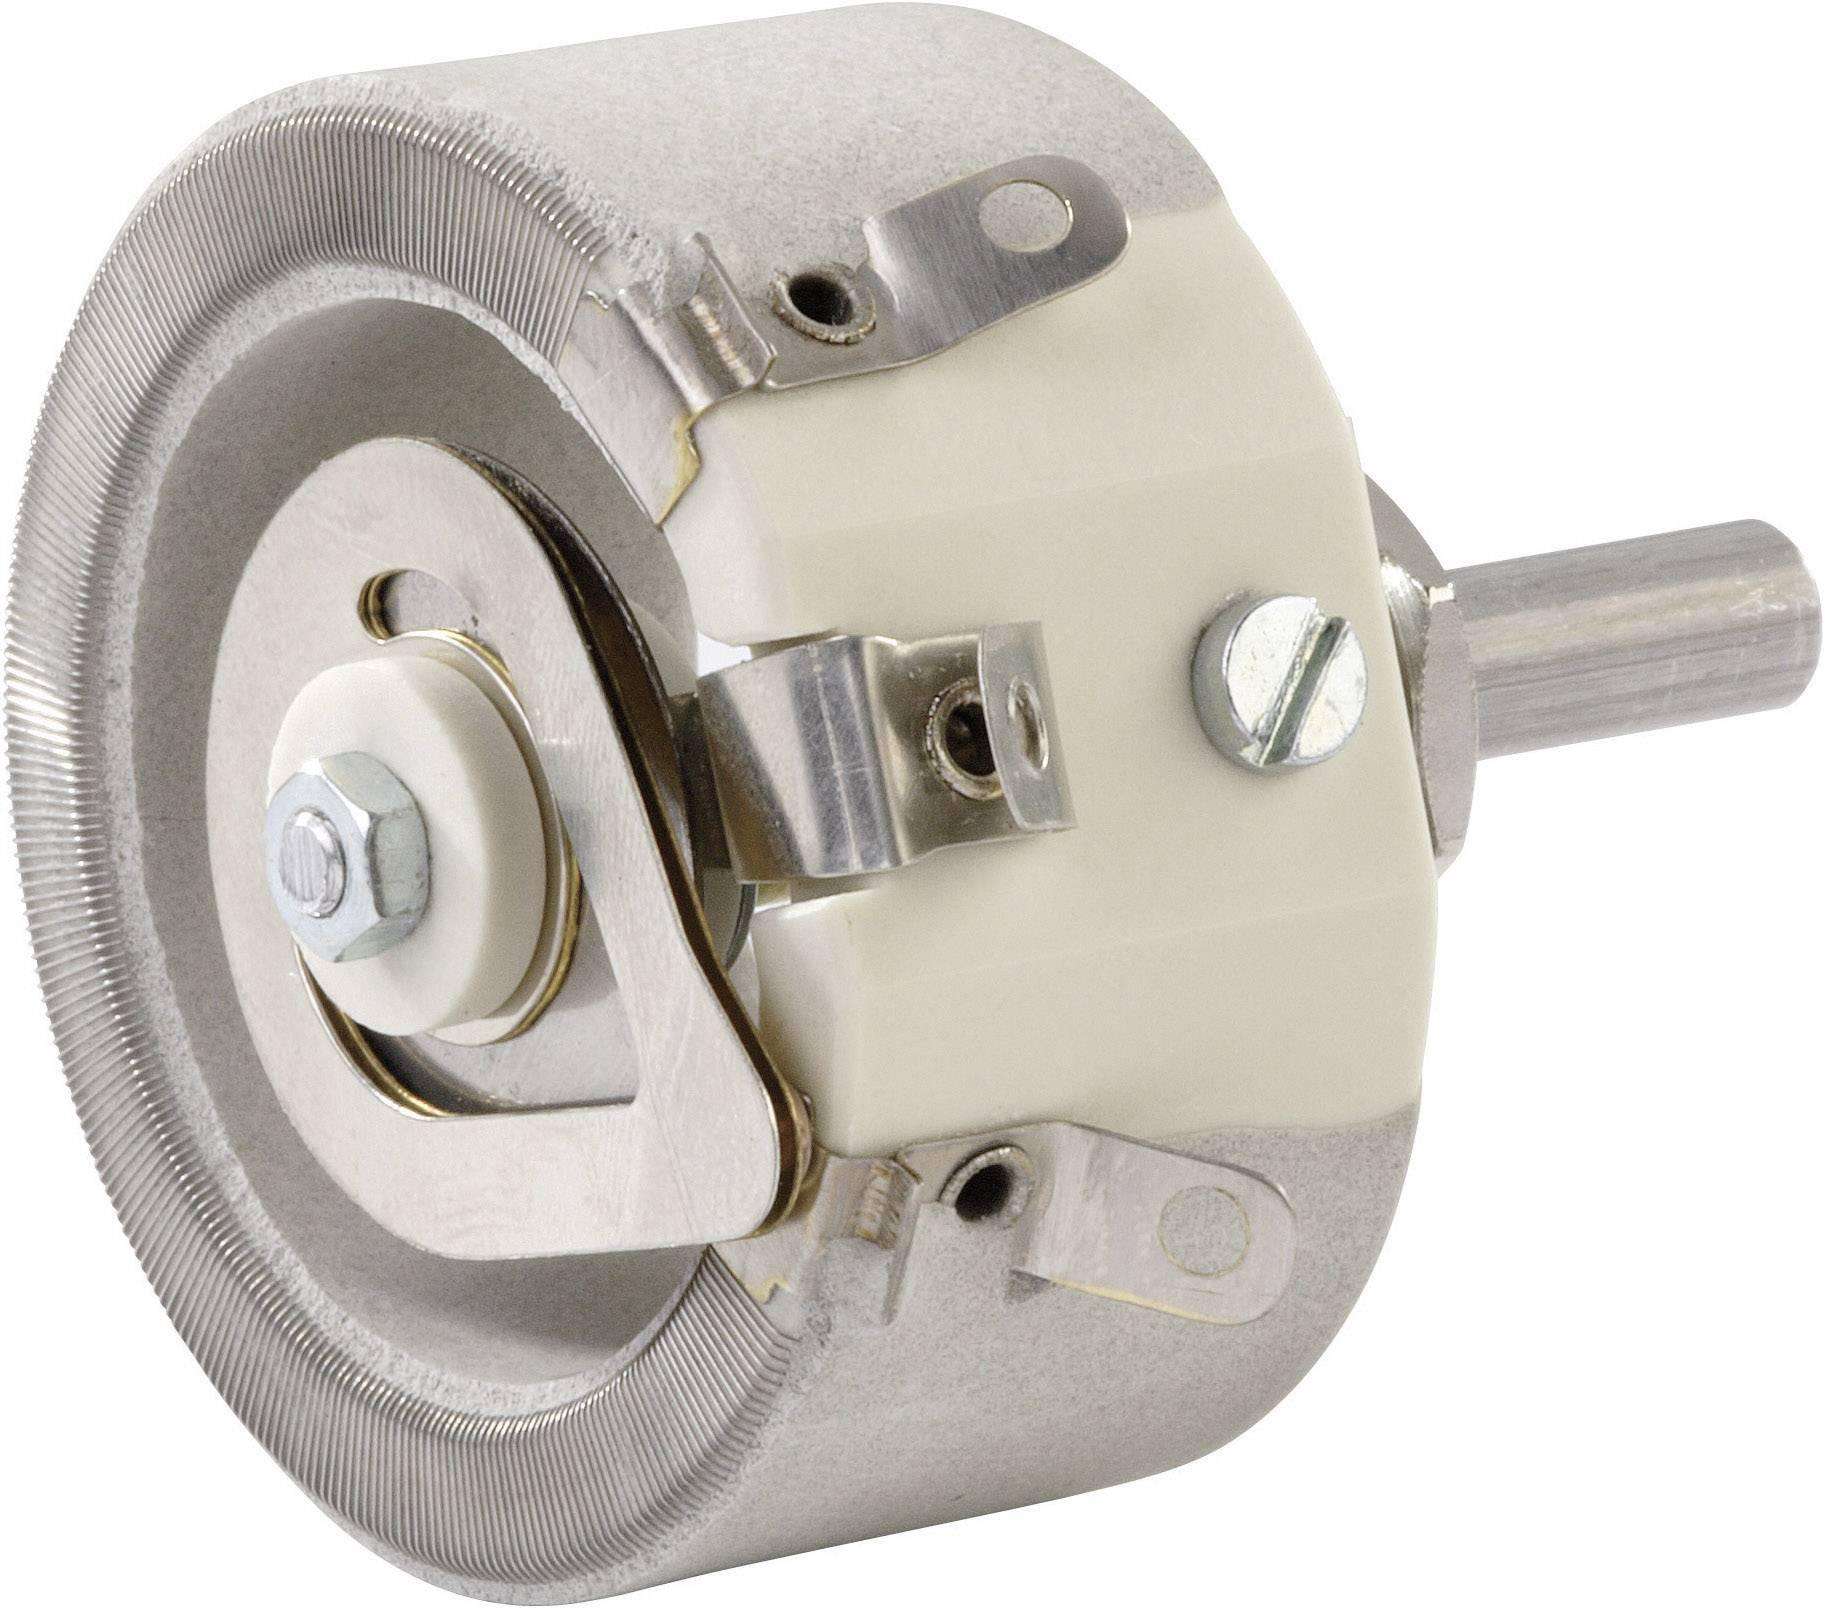 Drôtový potenciometer mono TT Electronics AB 3191102600 3191102600, 30 W, 10 Ohm, 1 ks